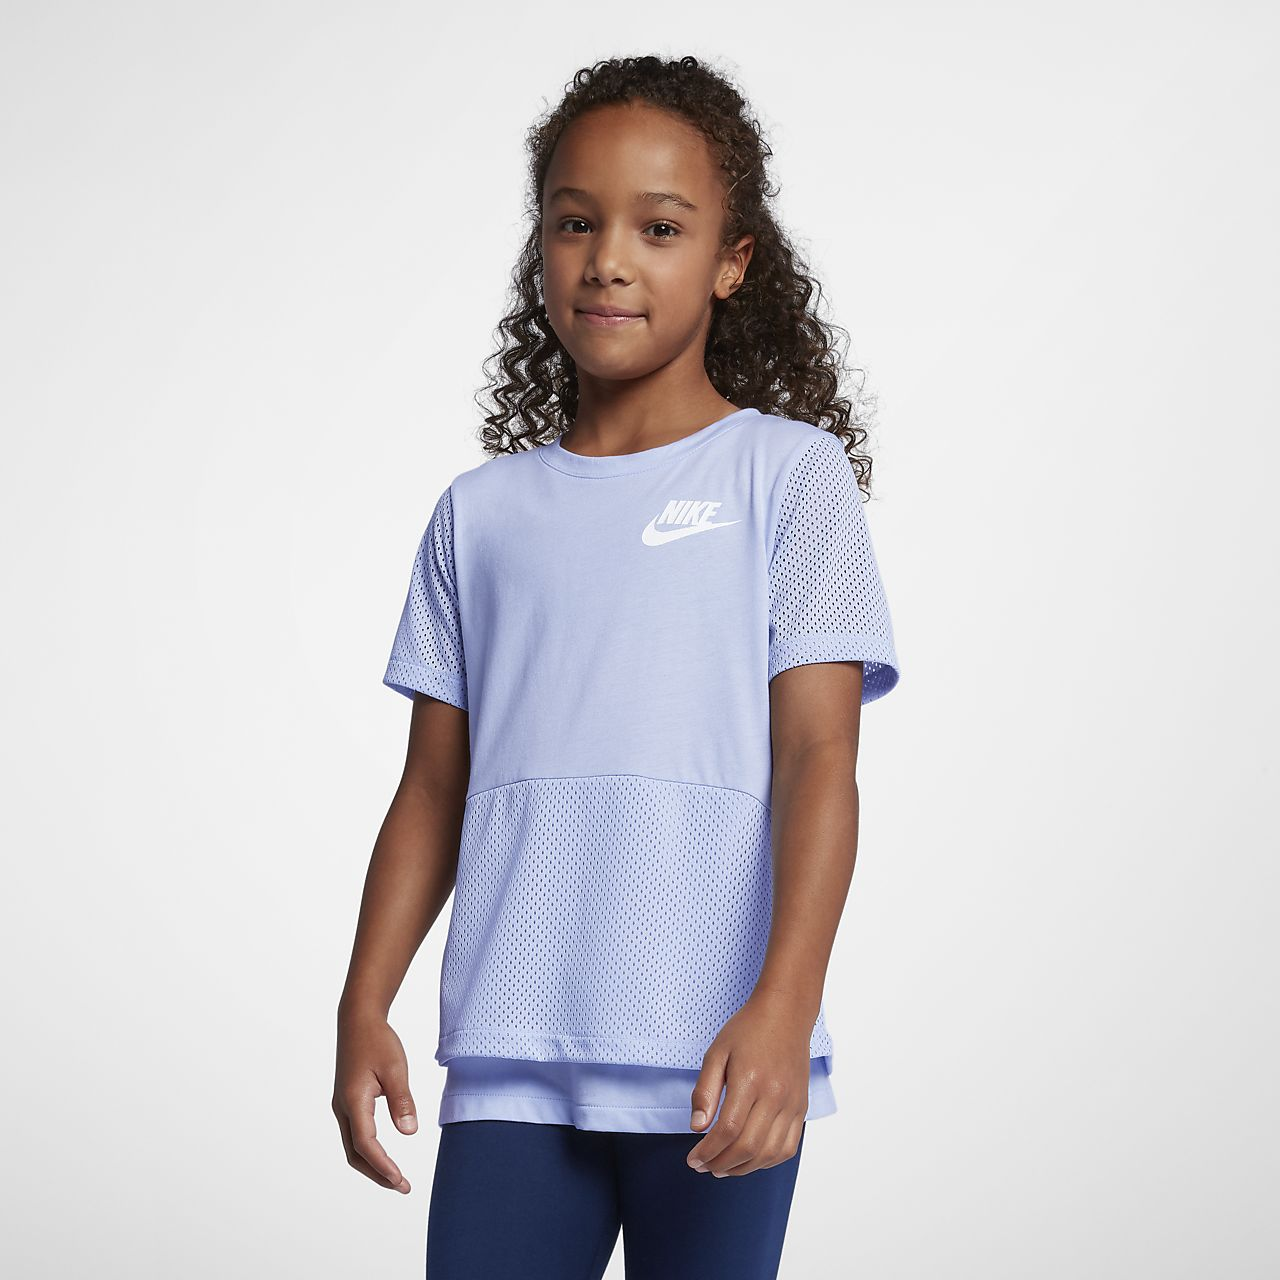 Nike Sportswear Big Kids' (Girls') Short Sleeve Top